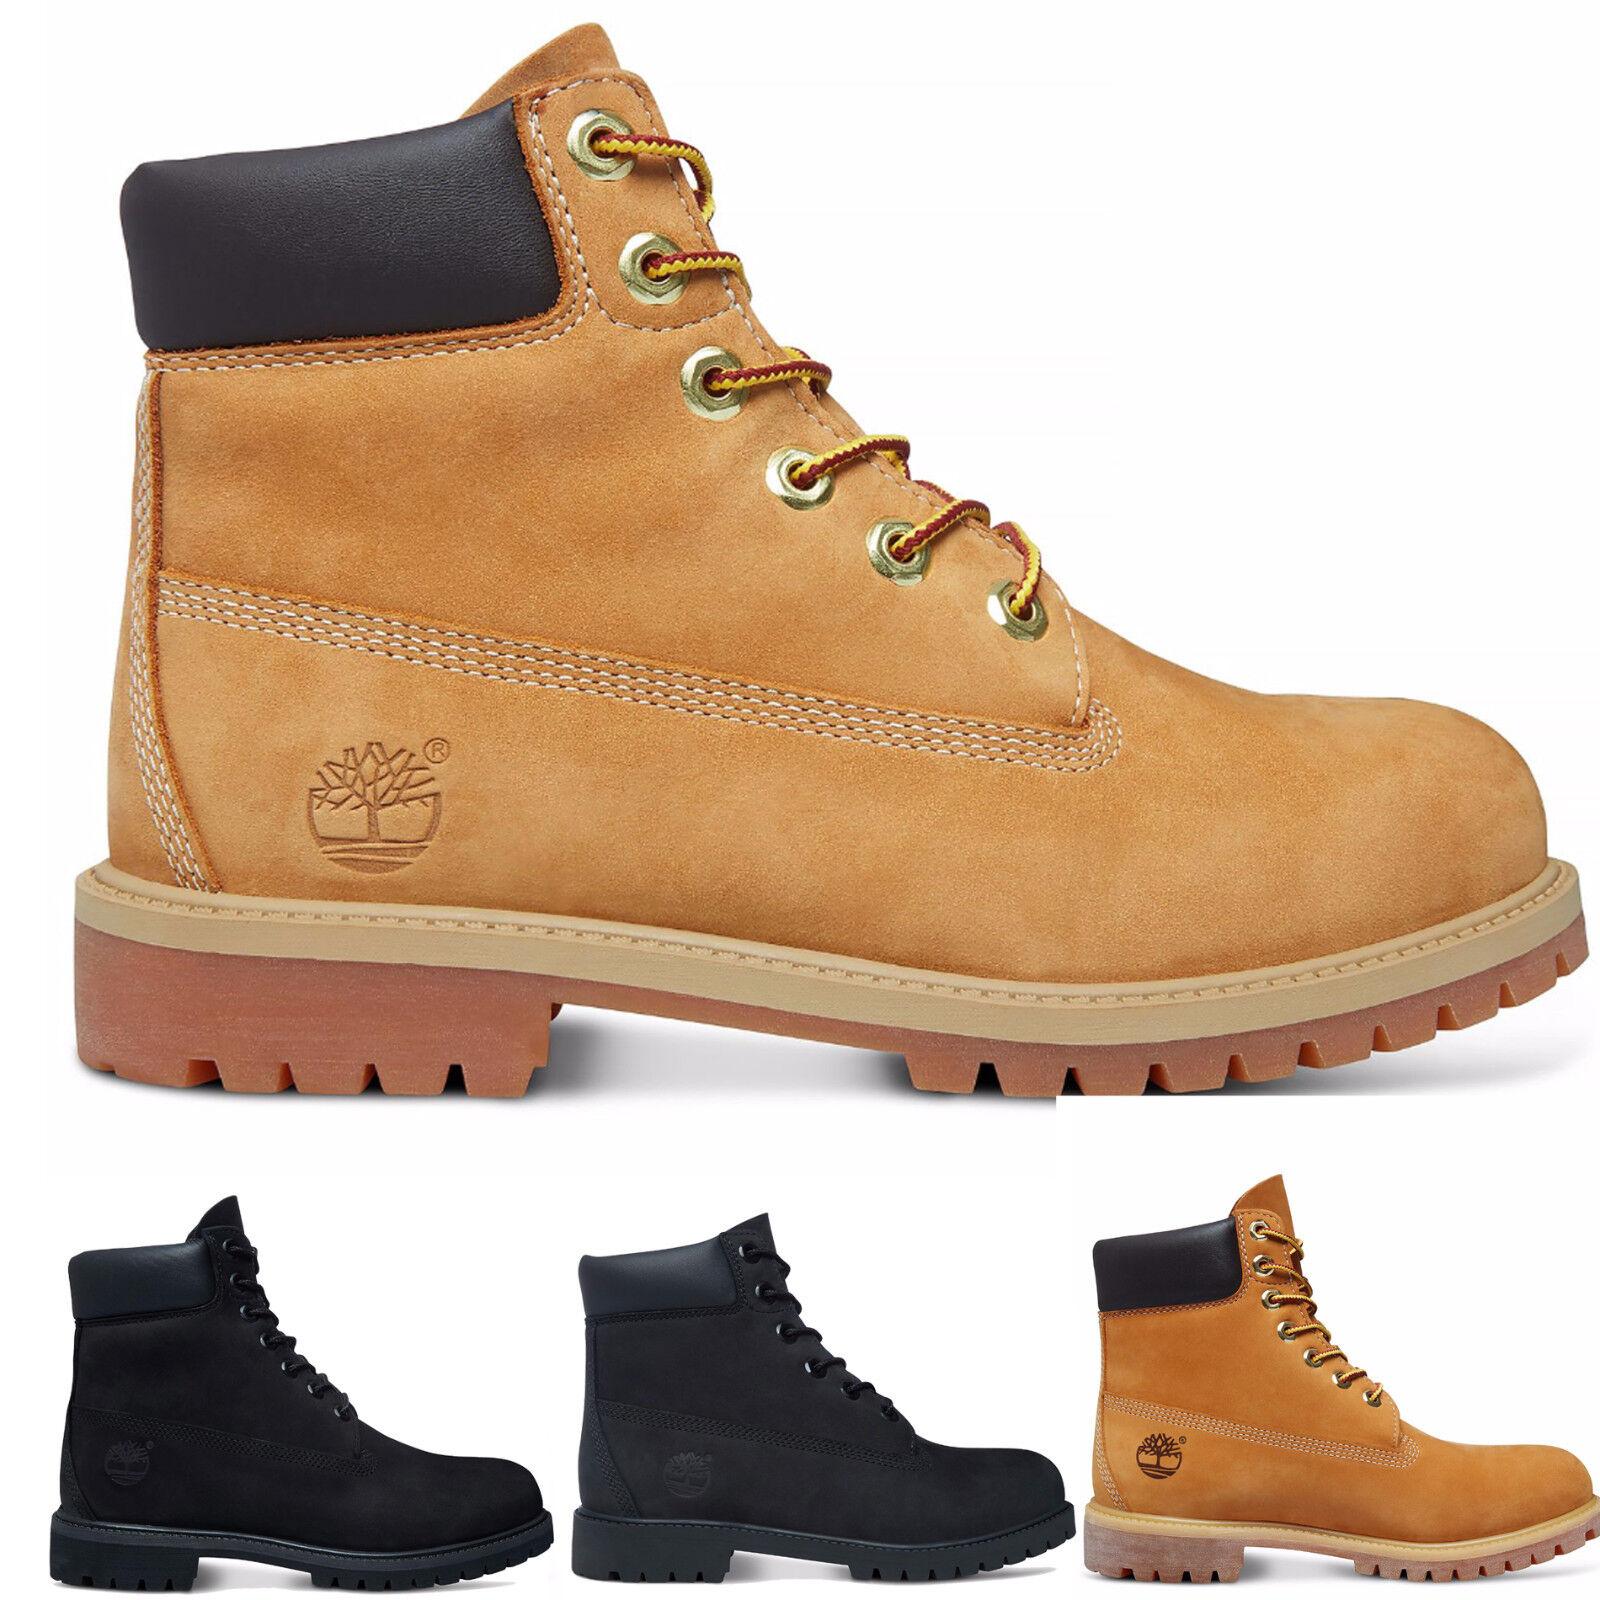 4dd3f68e735d Timberland - 6-Inch Premium Waterproof Boots Herren Damen Kinder Freizeit  Boot фото